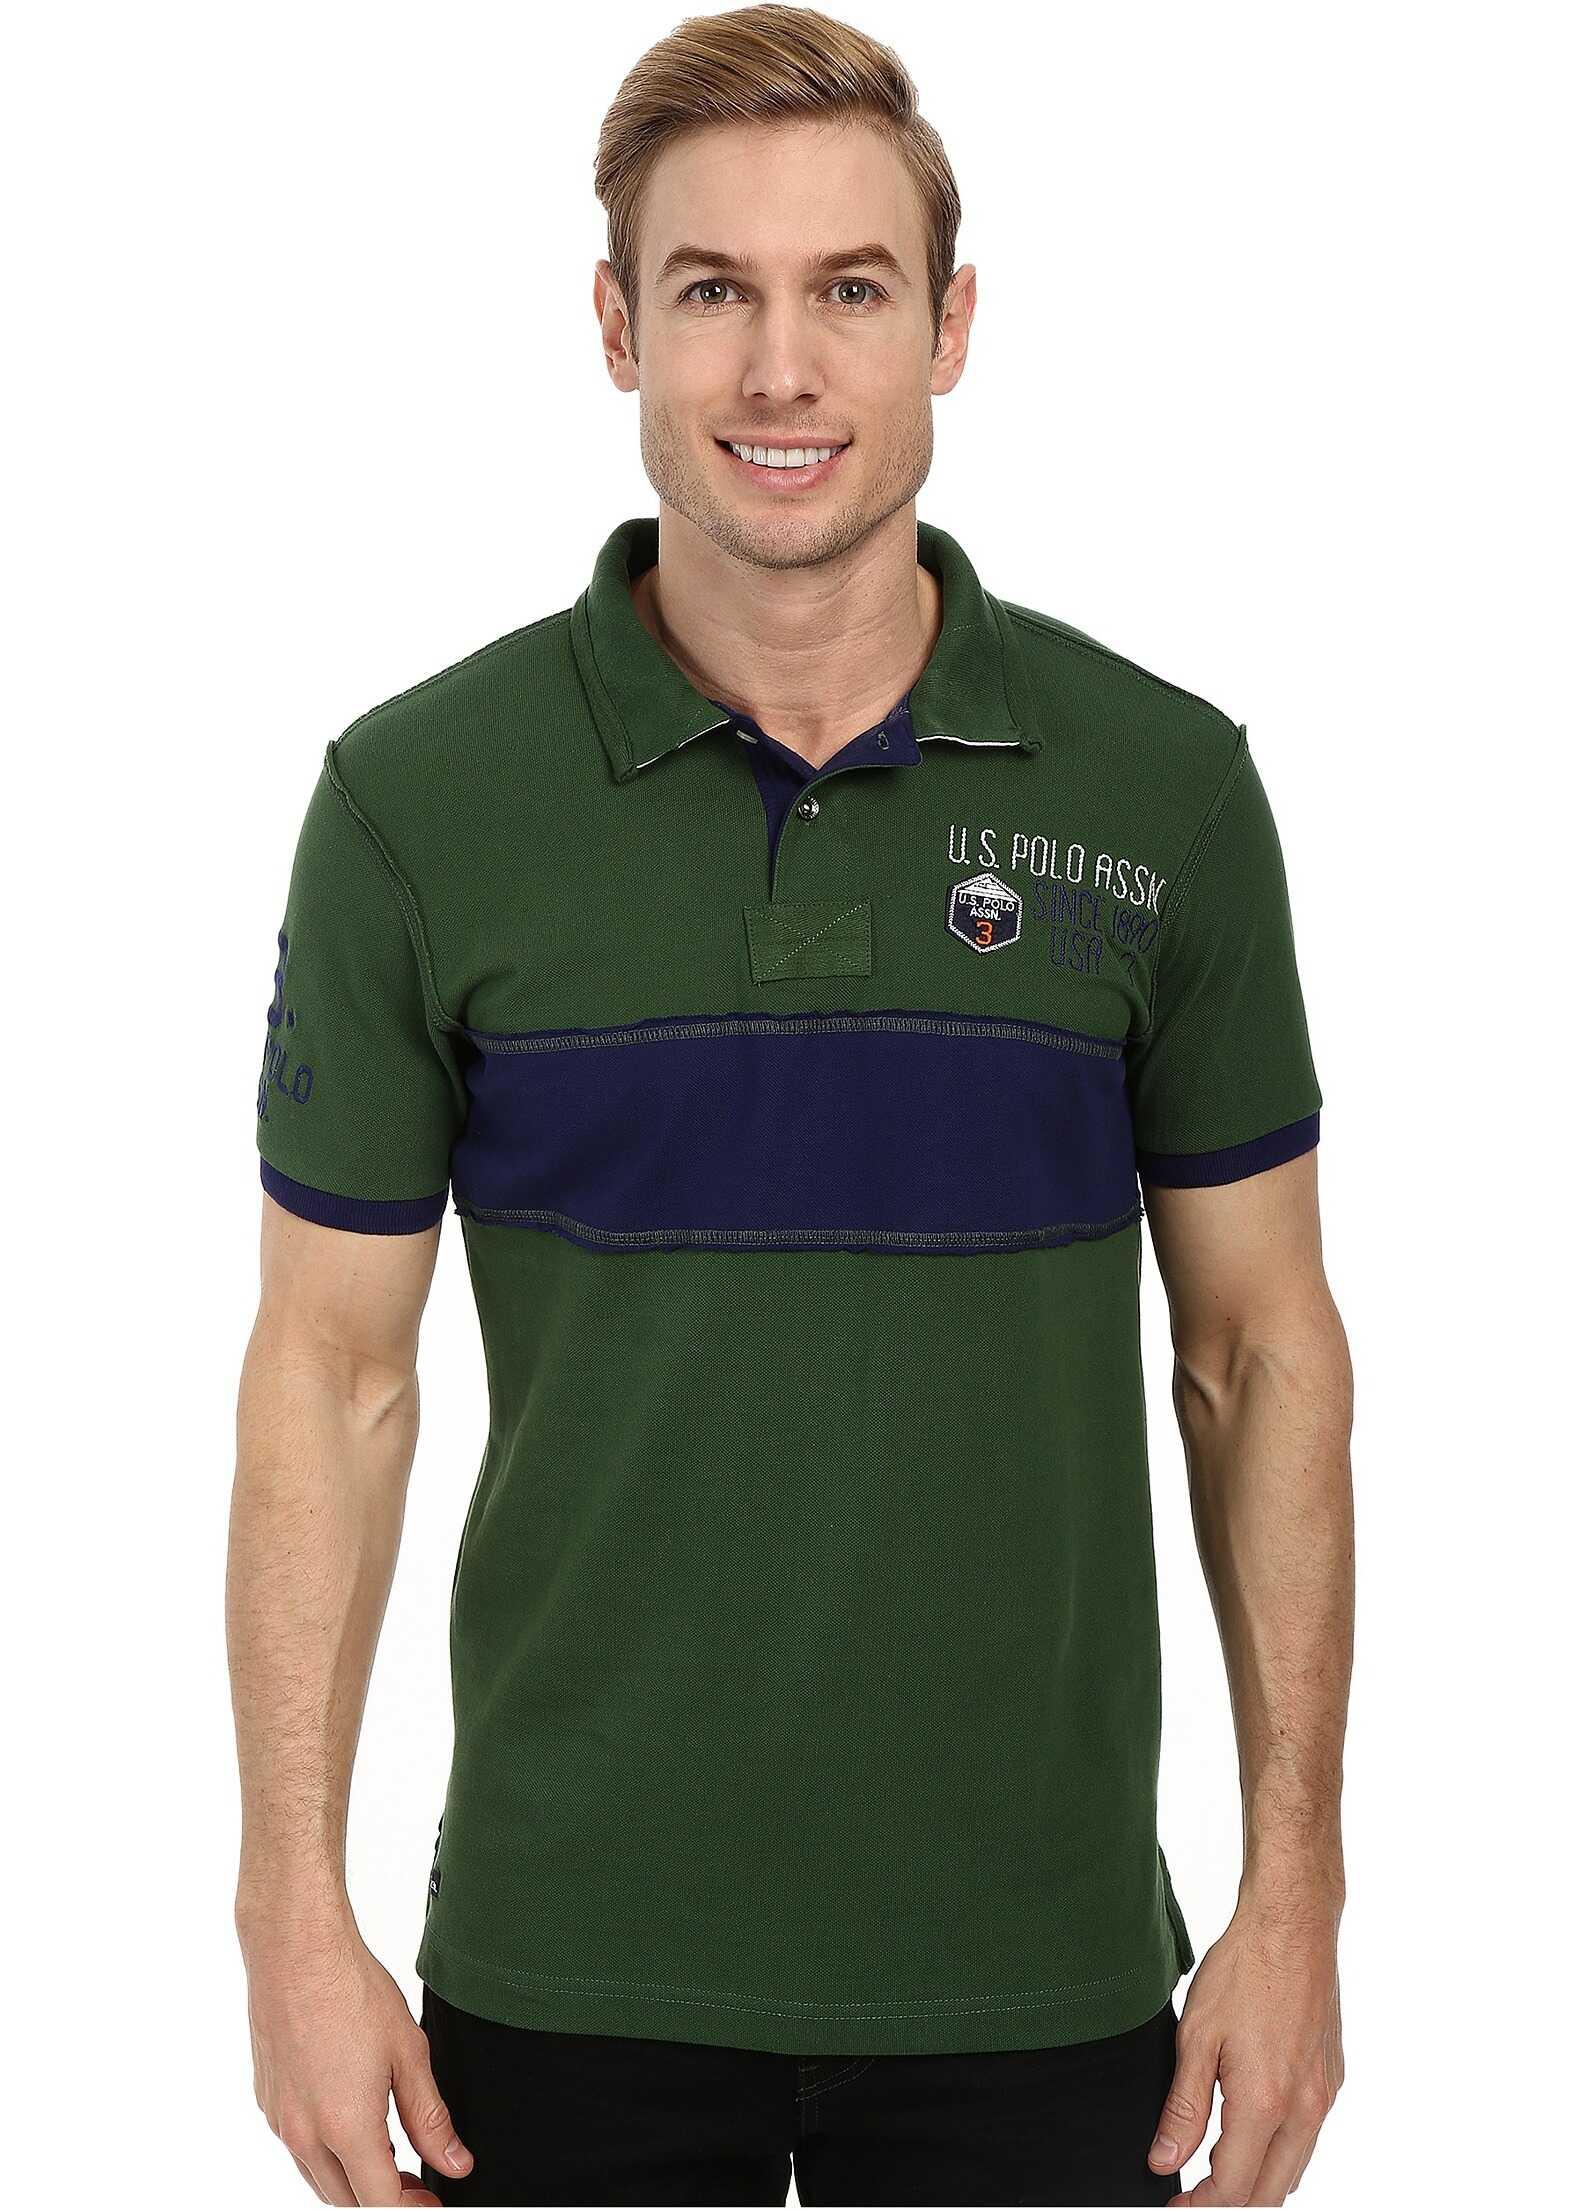 U.S. POLO ASSN. Chest Stripe Slim Fit Polo Cyber Green